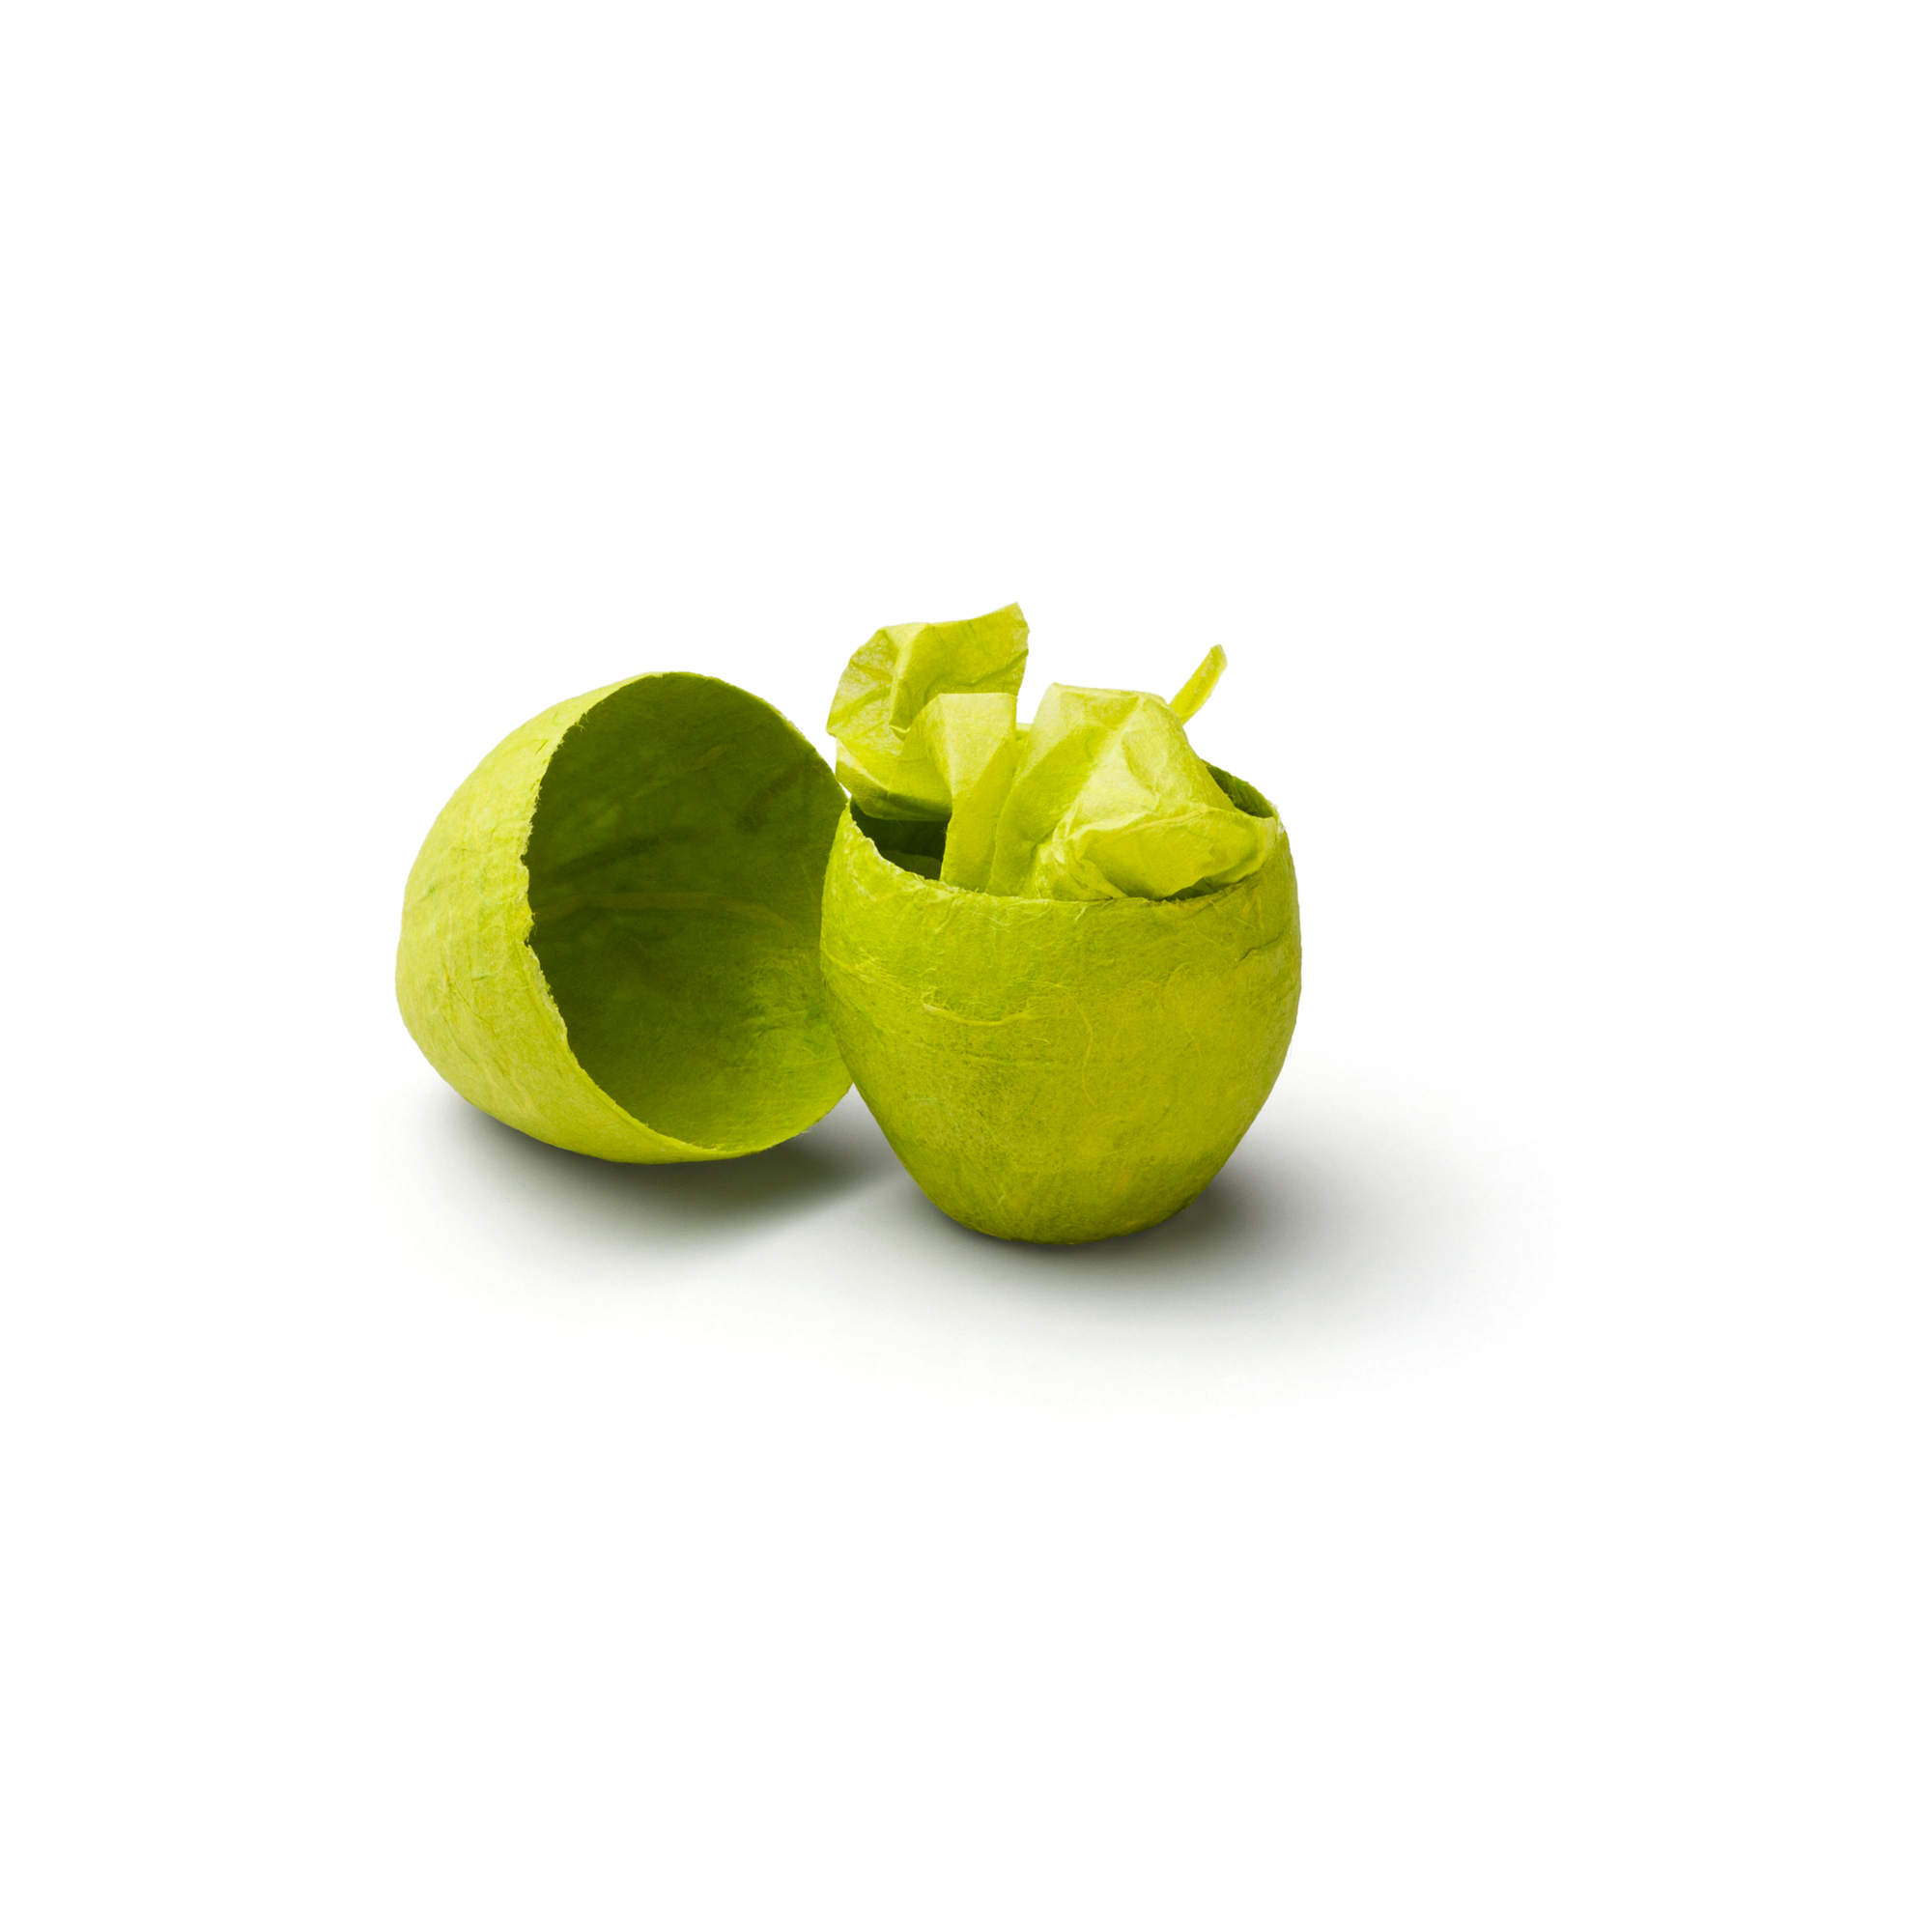 EGG PACKAGING standard green